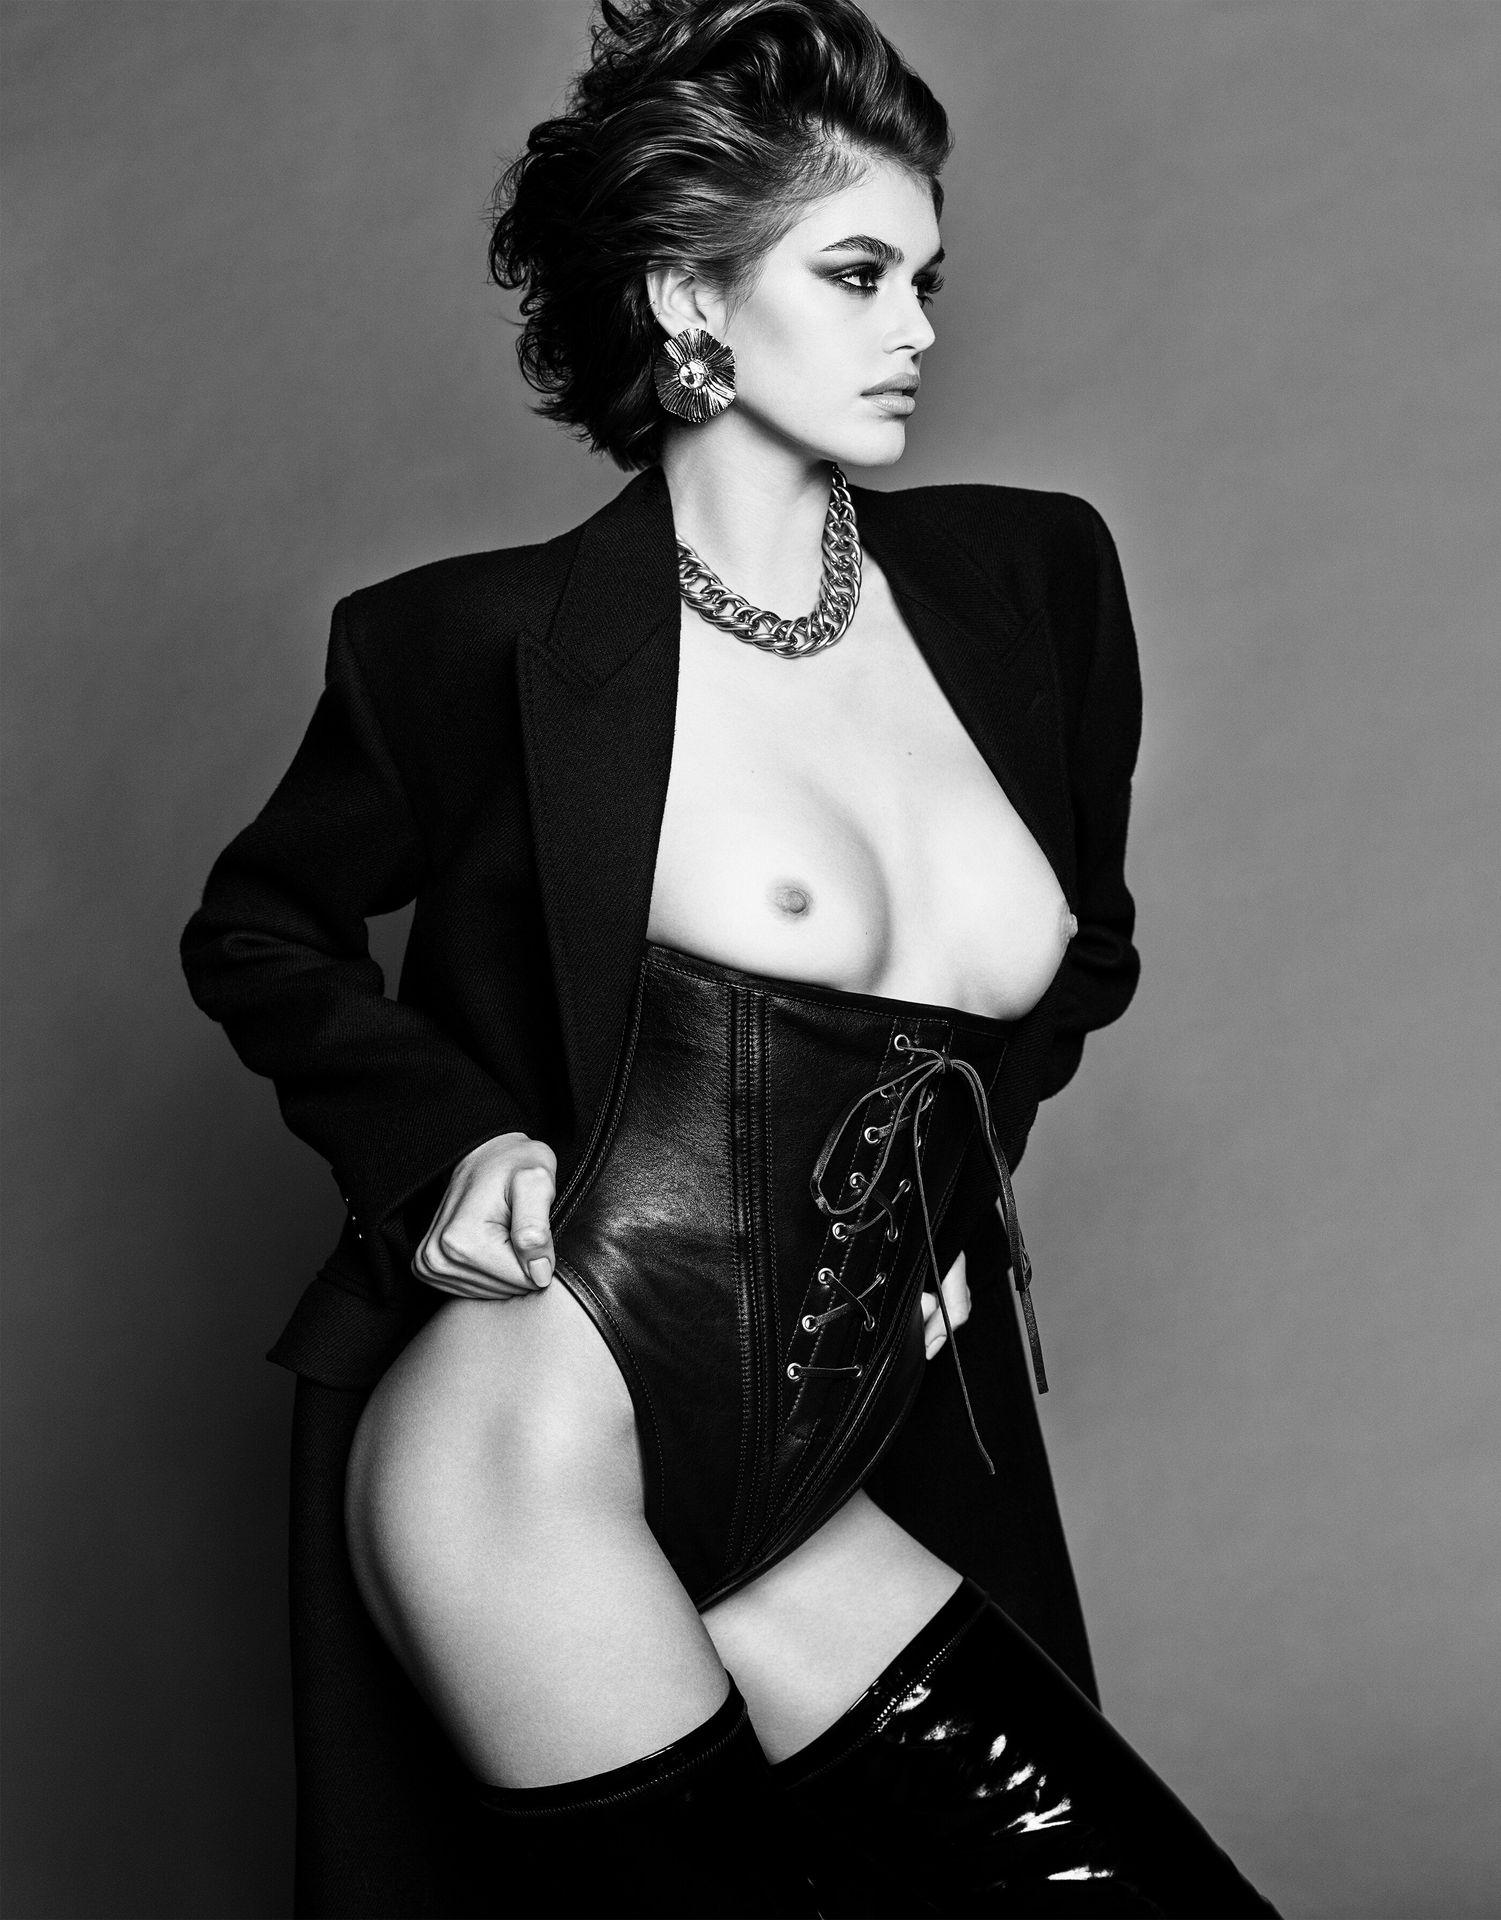 Kaia Gerber Tits photo 27